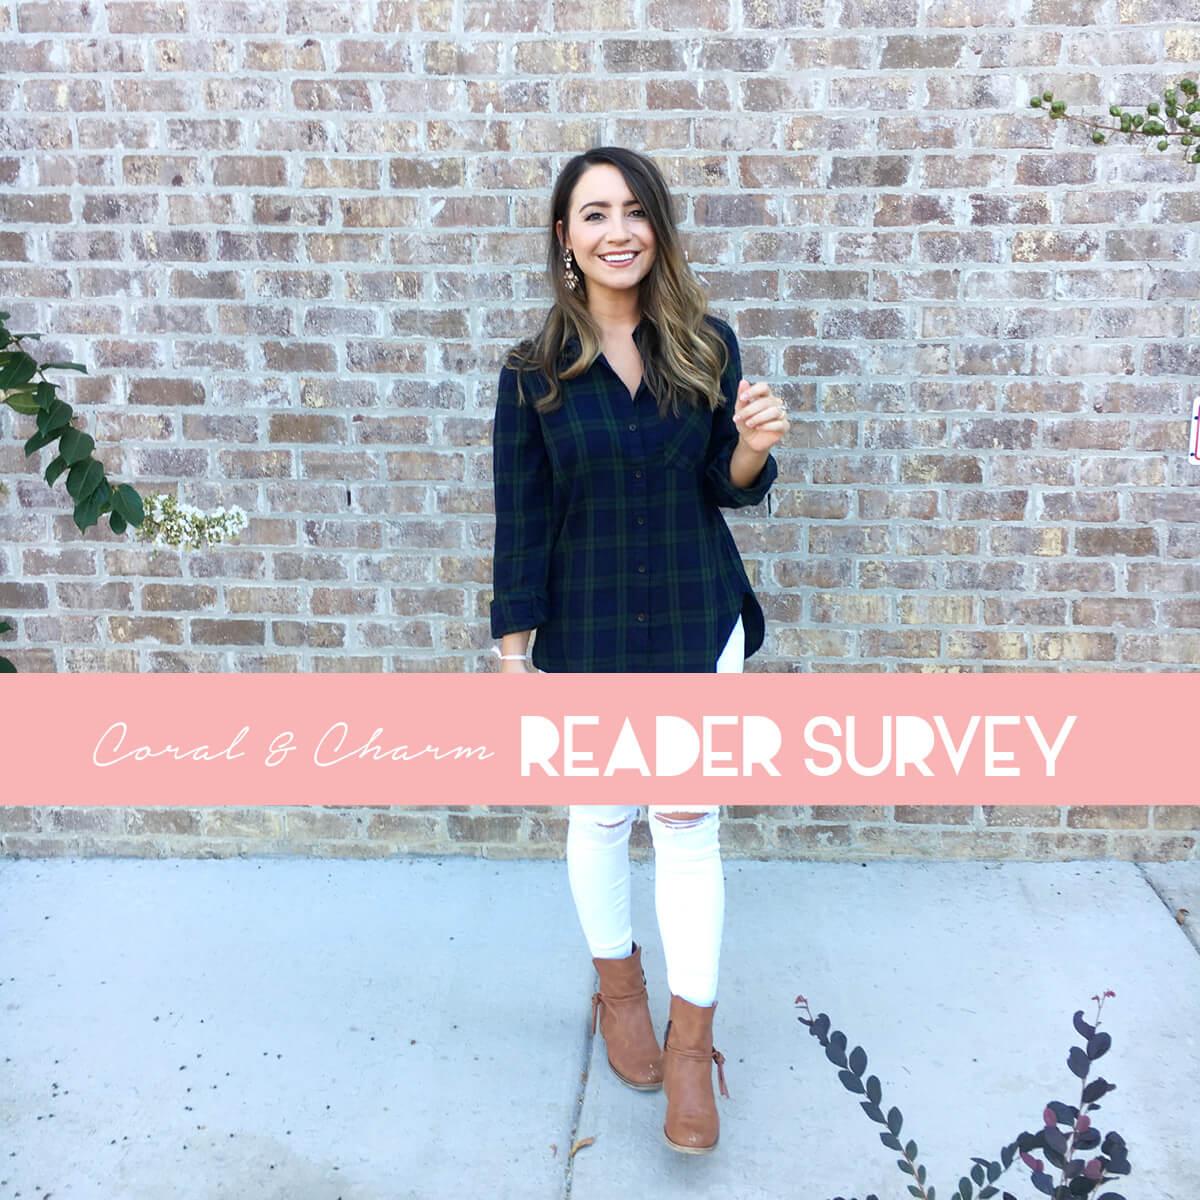 readersurvey